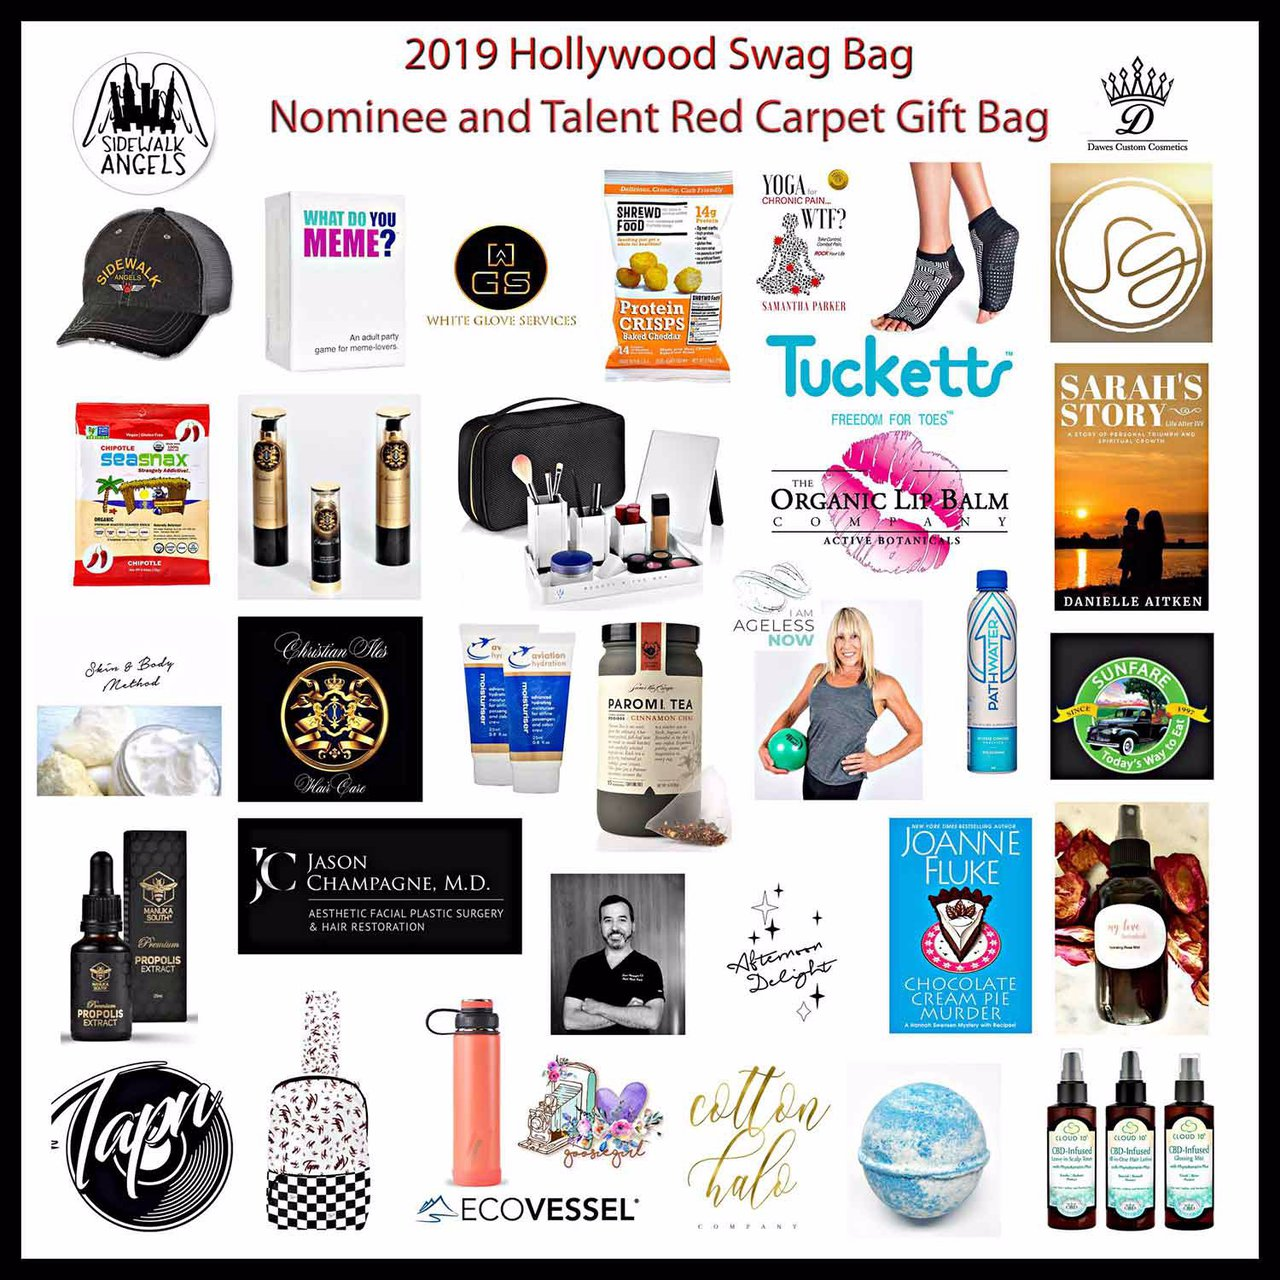 Various Custom Lipstick Bar Pop Ups photo whats-in-emmy-gift-bag-2019.jpg